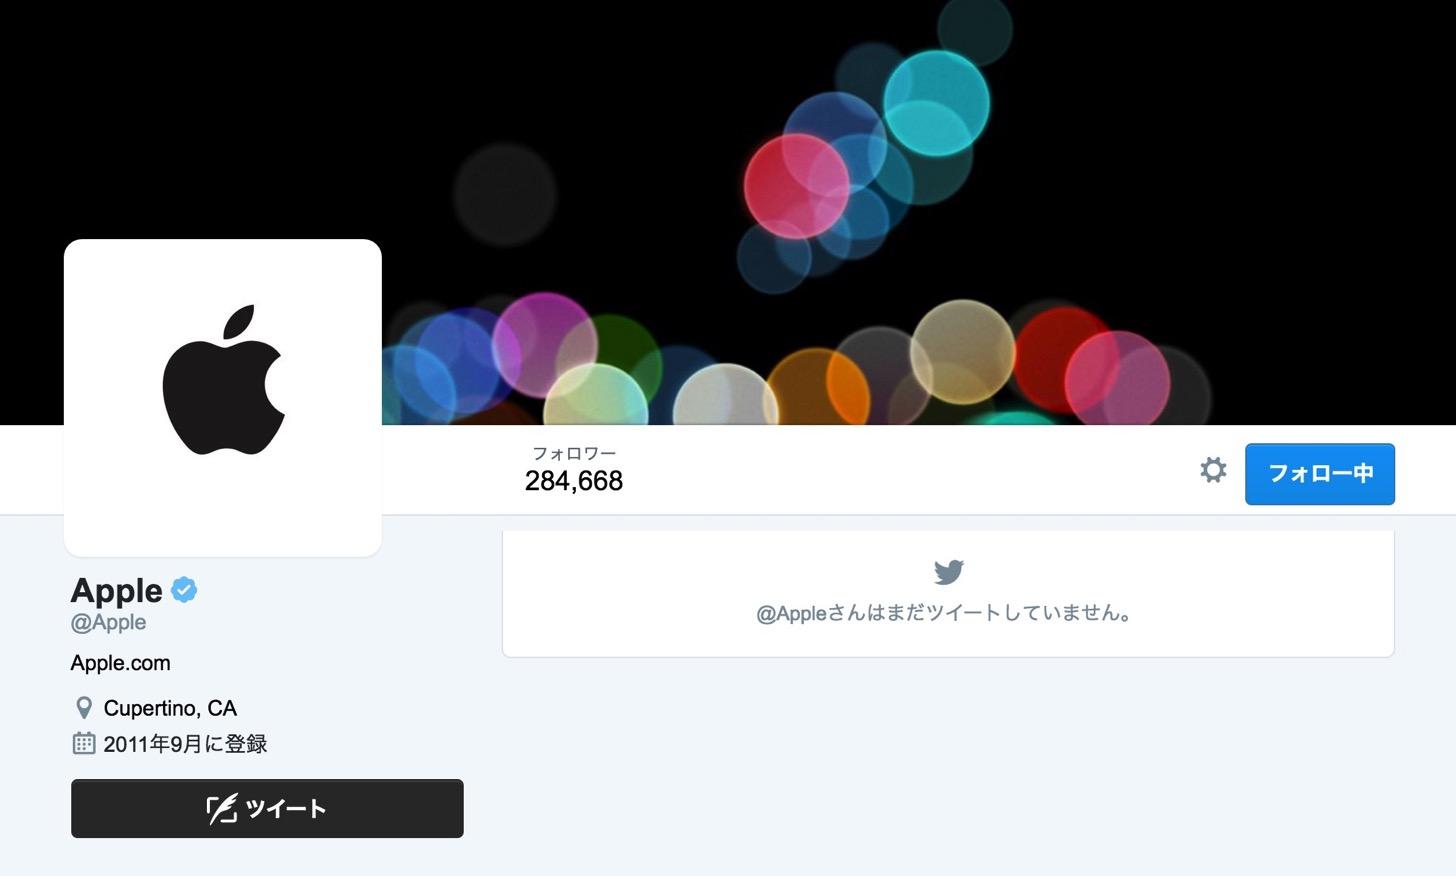 Appleの公式Twitter